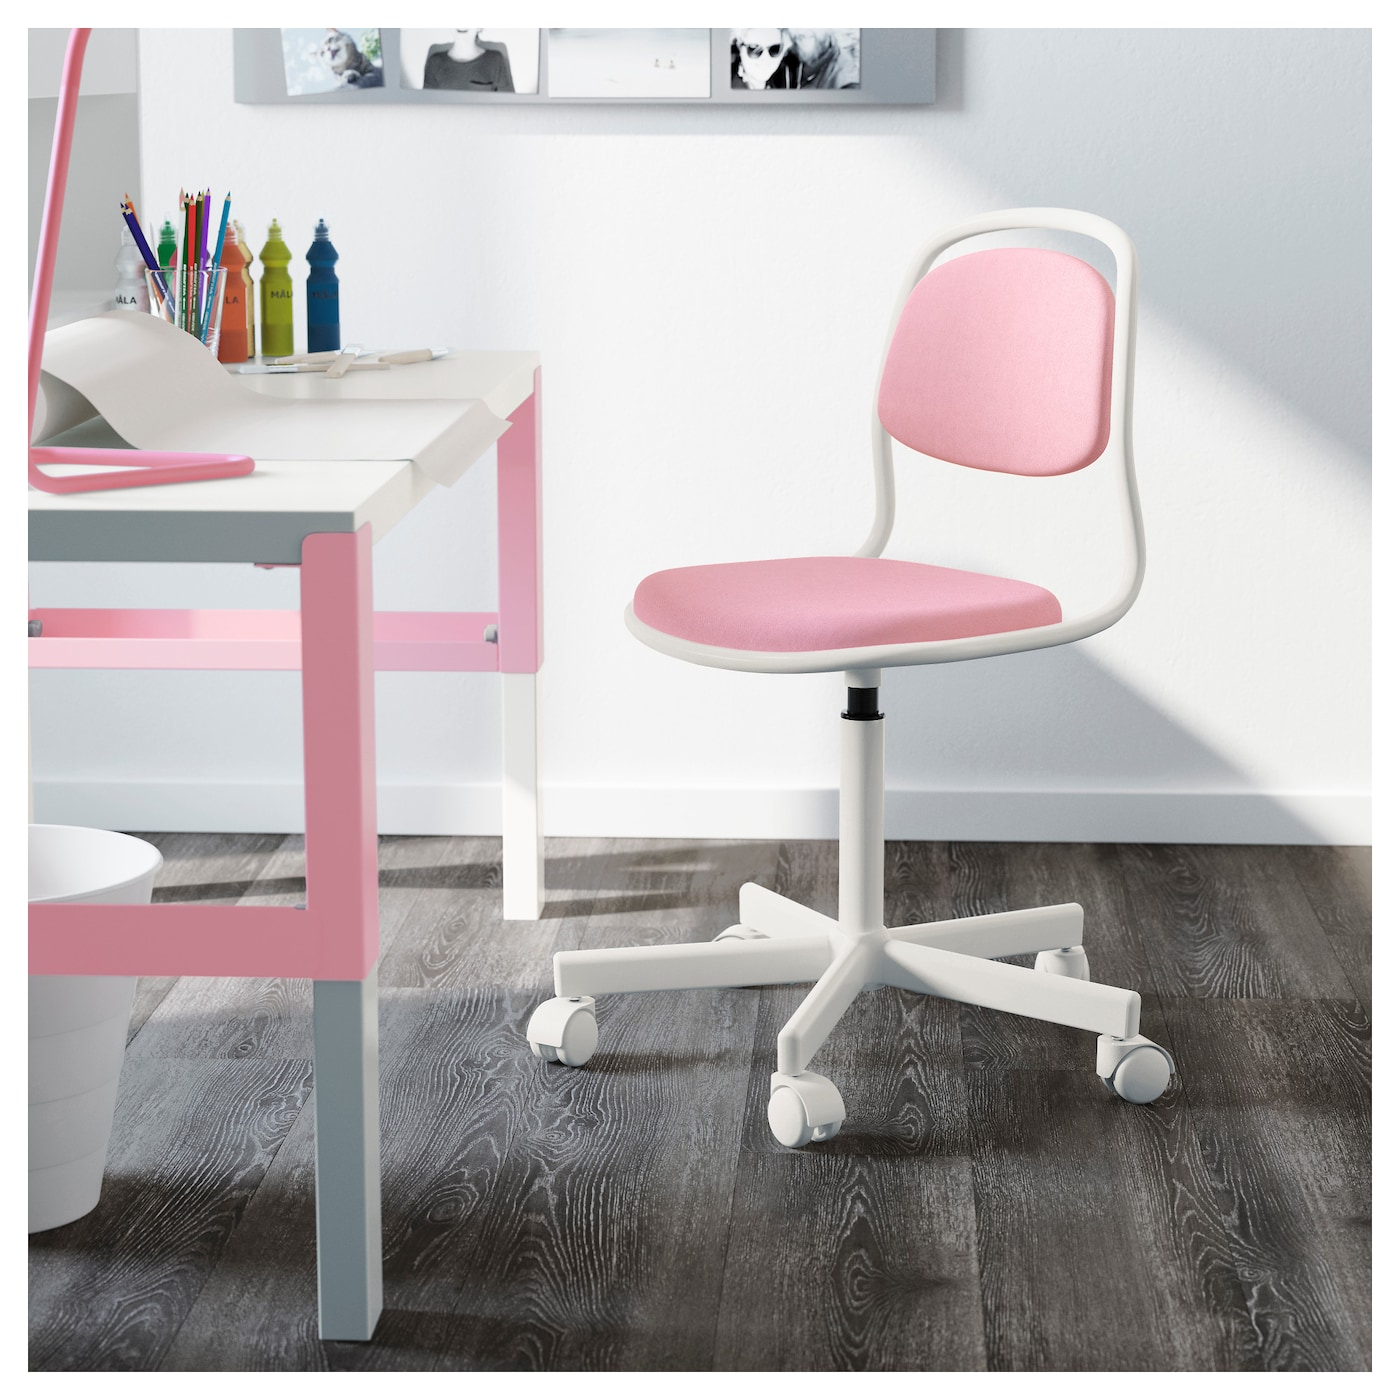 rfj ll chaise de bureau enfant blanc vissle rose ikea. Black Bedroom Furniture Sets. Home Design Ideas